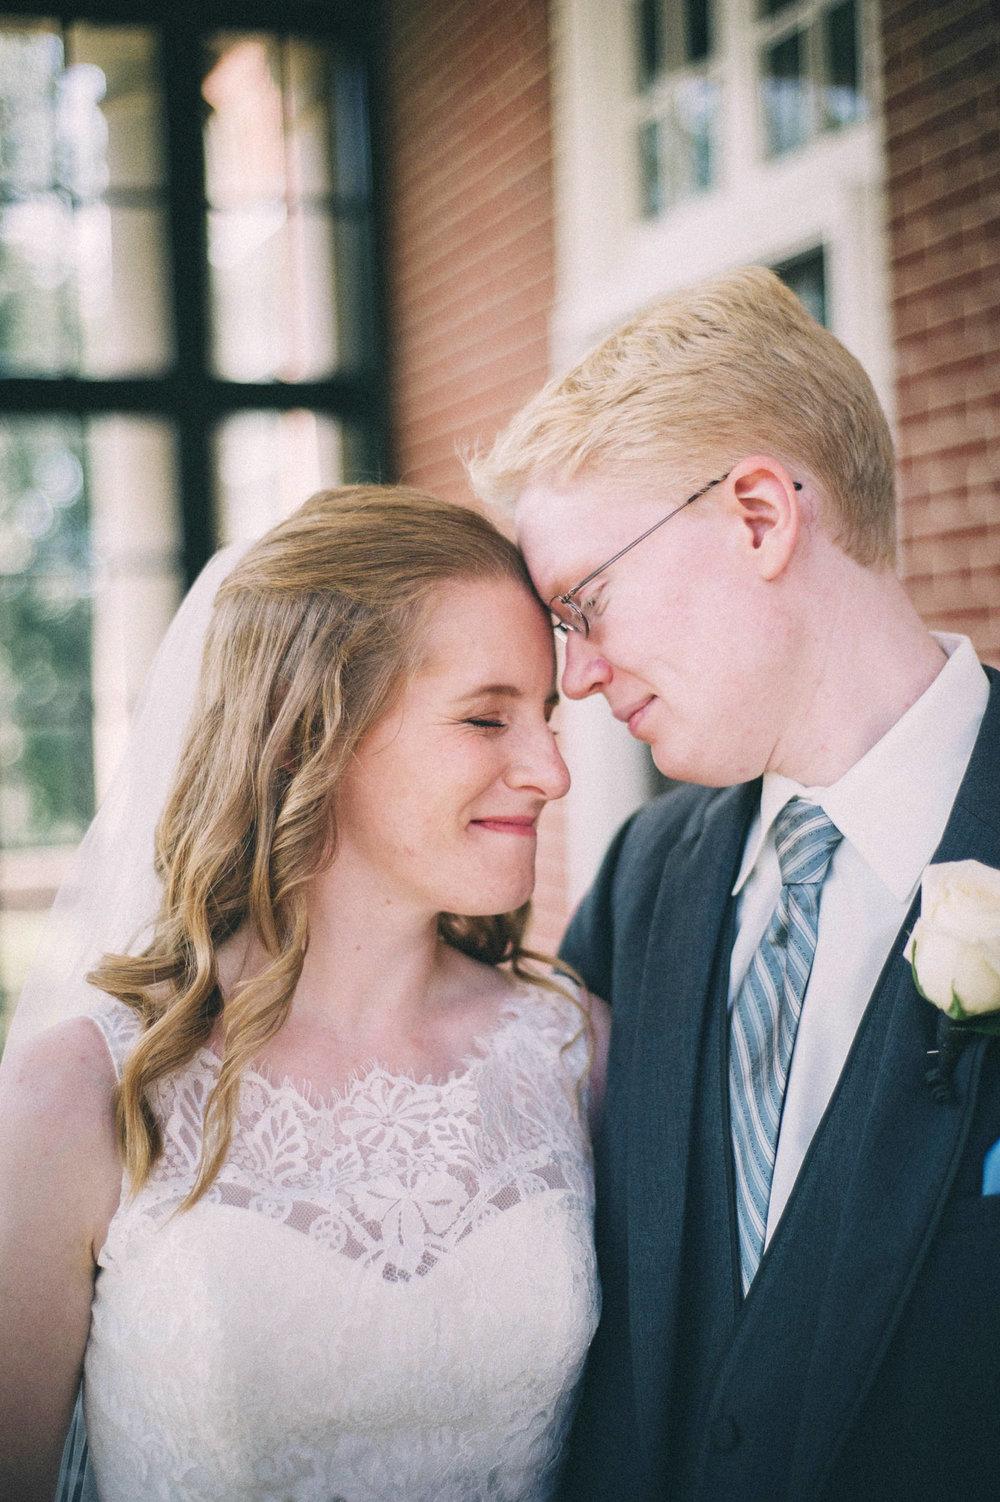 Jenna-Patrick-Garden-Court-Presbyterian-Seminary-Wedding-Louisville-Kentucky-Sarah-Katherine-Davis-Photography-62.jpg